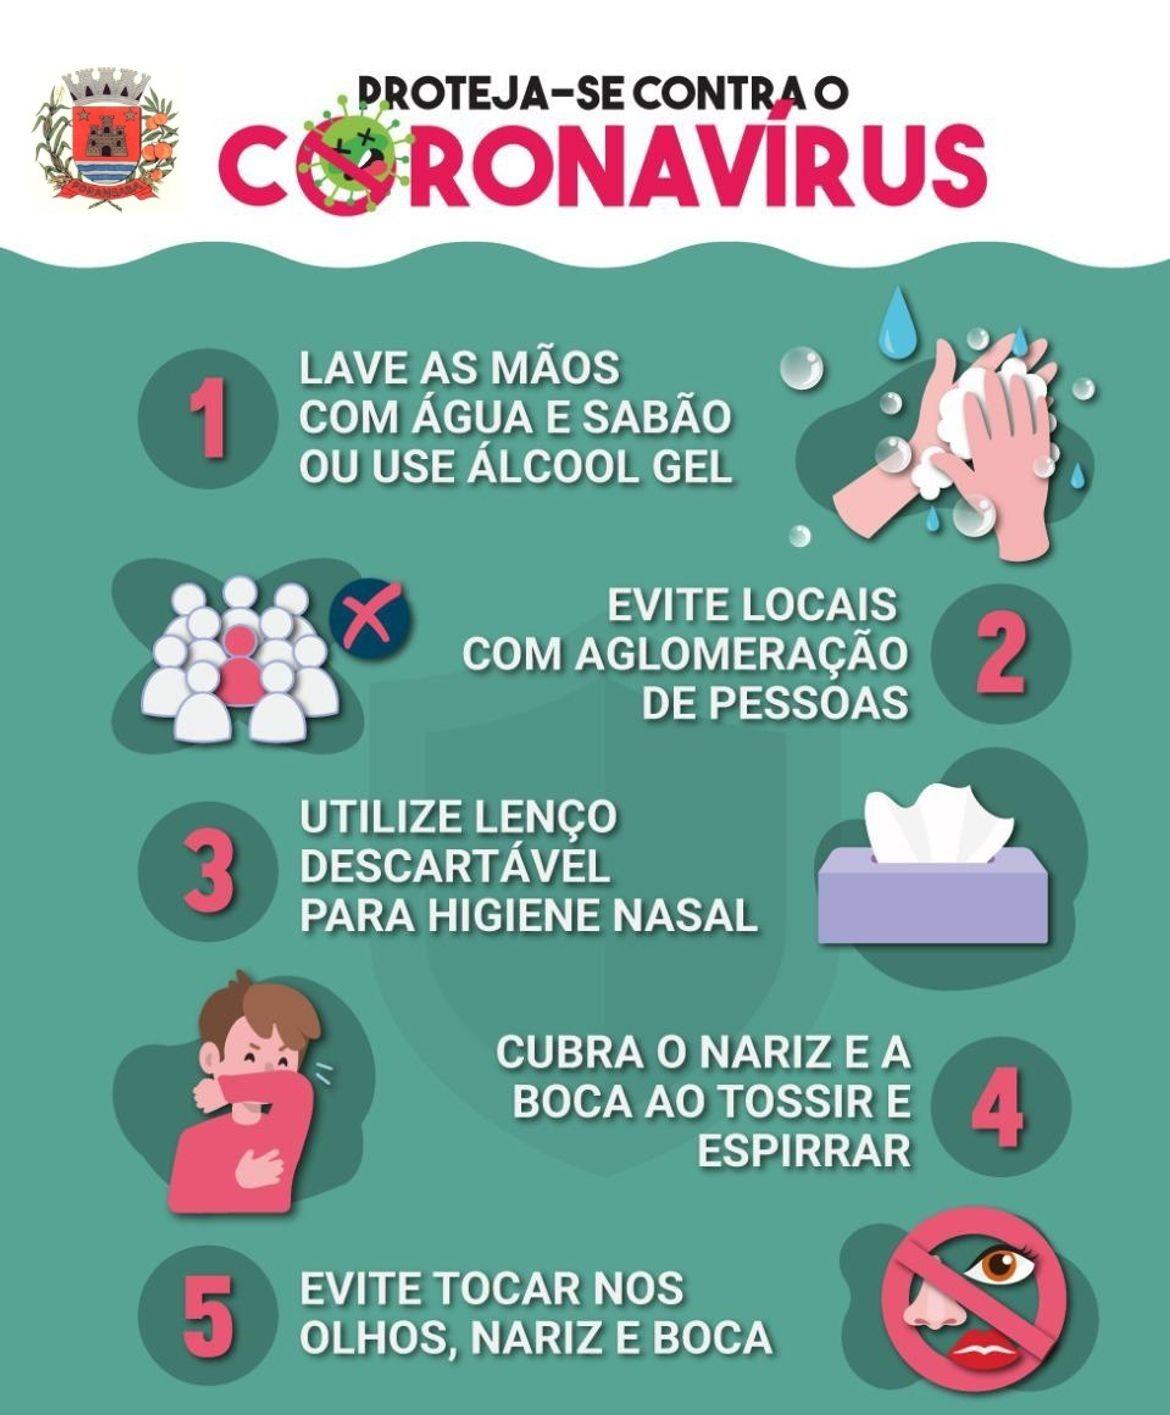 Coronavirus - Prefeitura porangaba